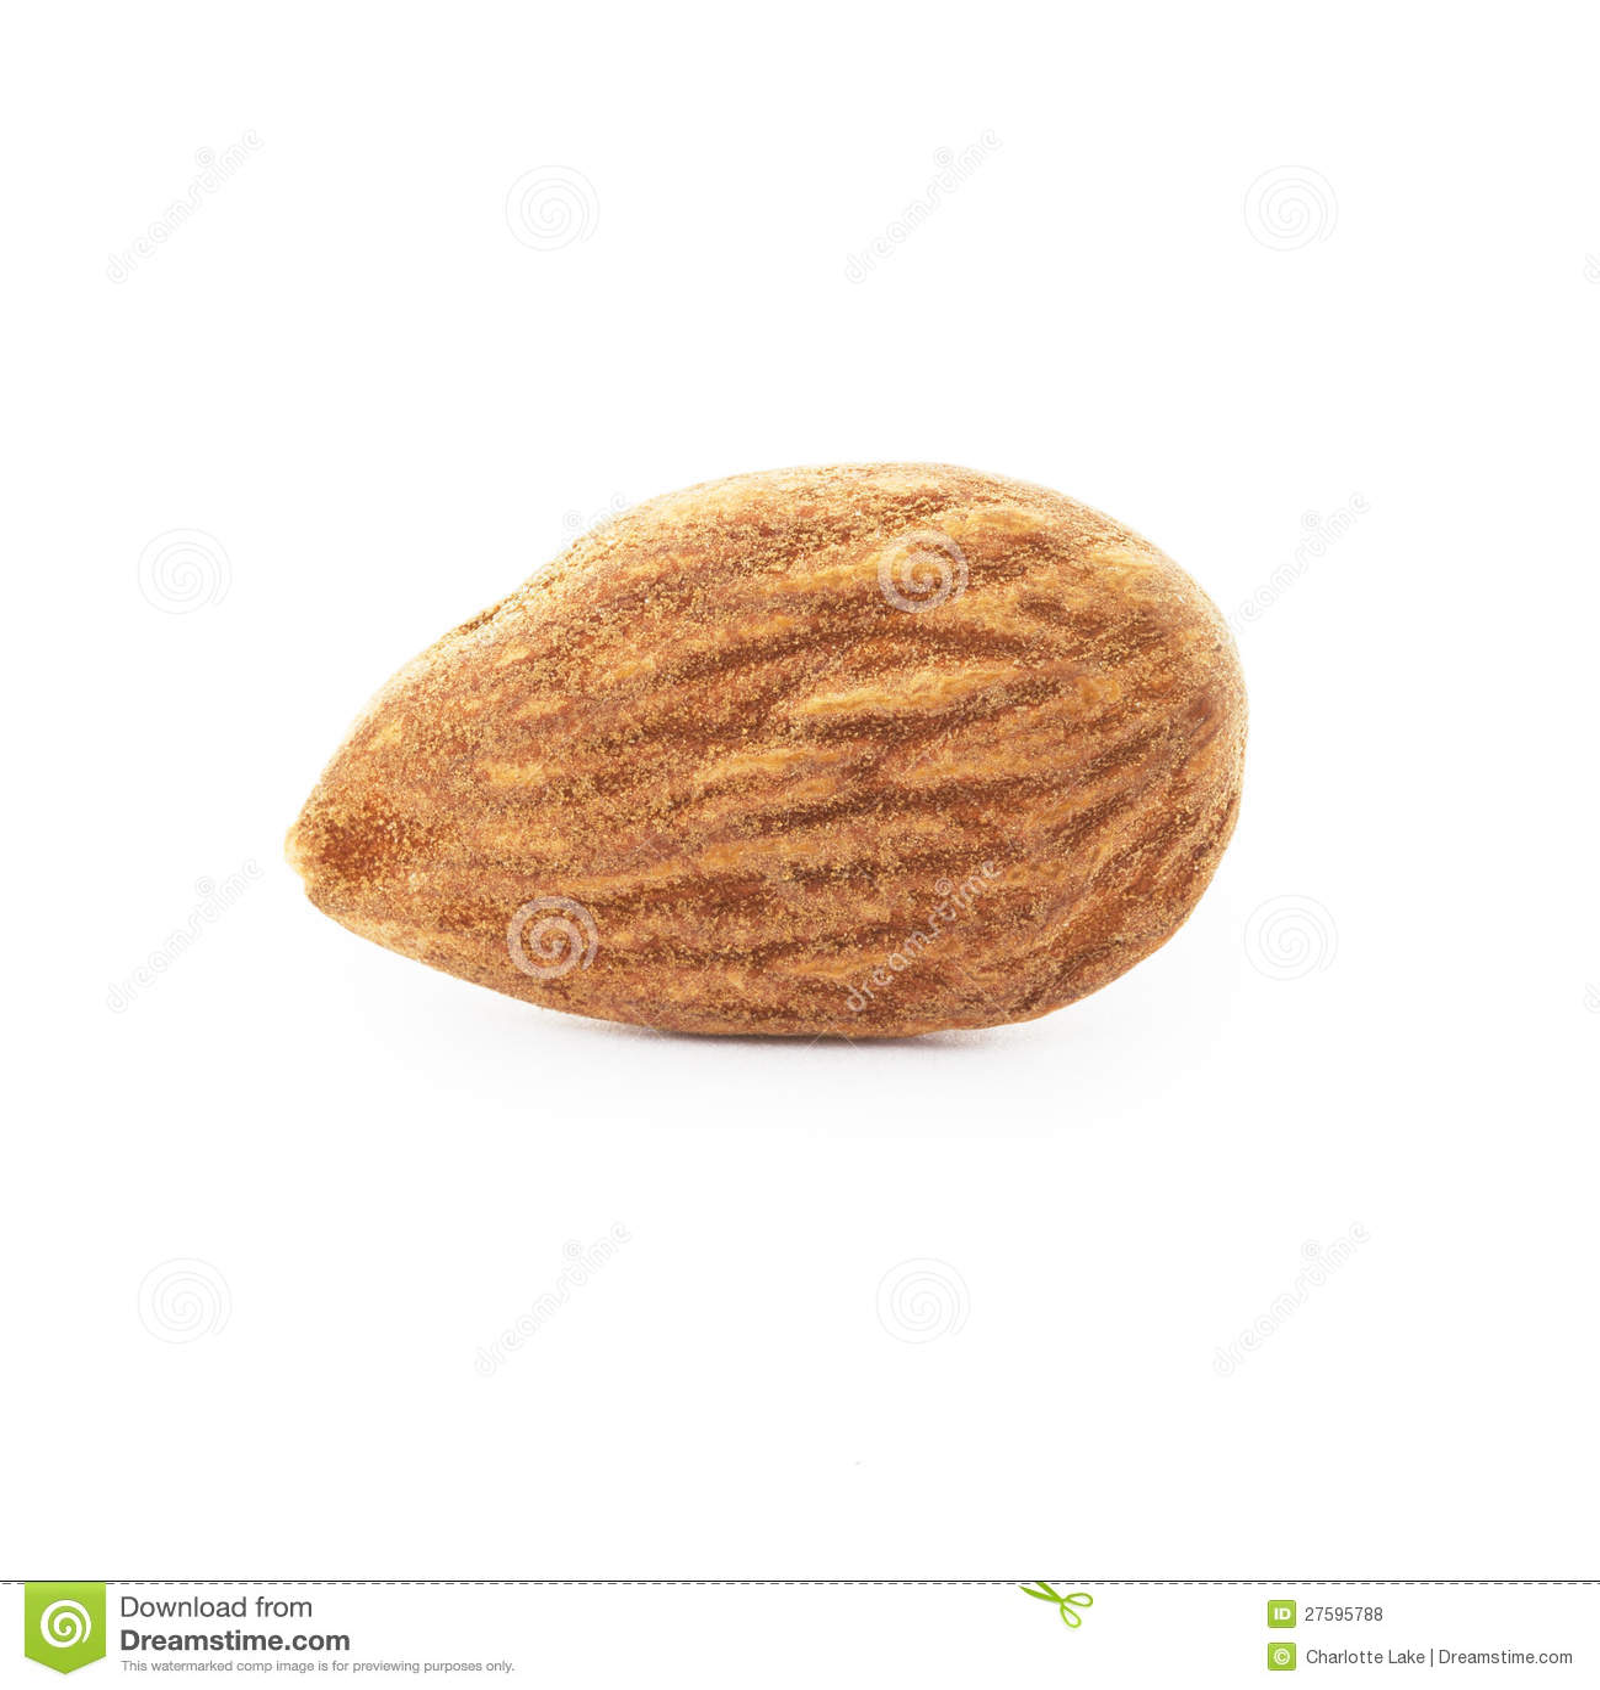 One Almond Royalty Free Stock Photos - Image: 27595788 Almond